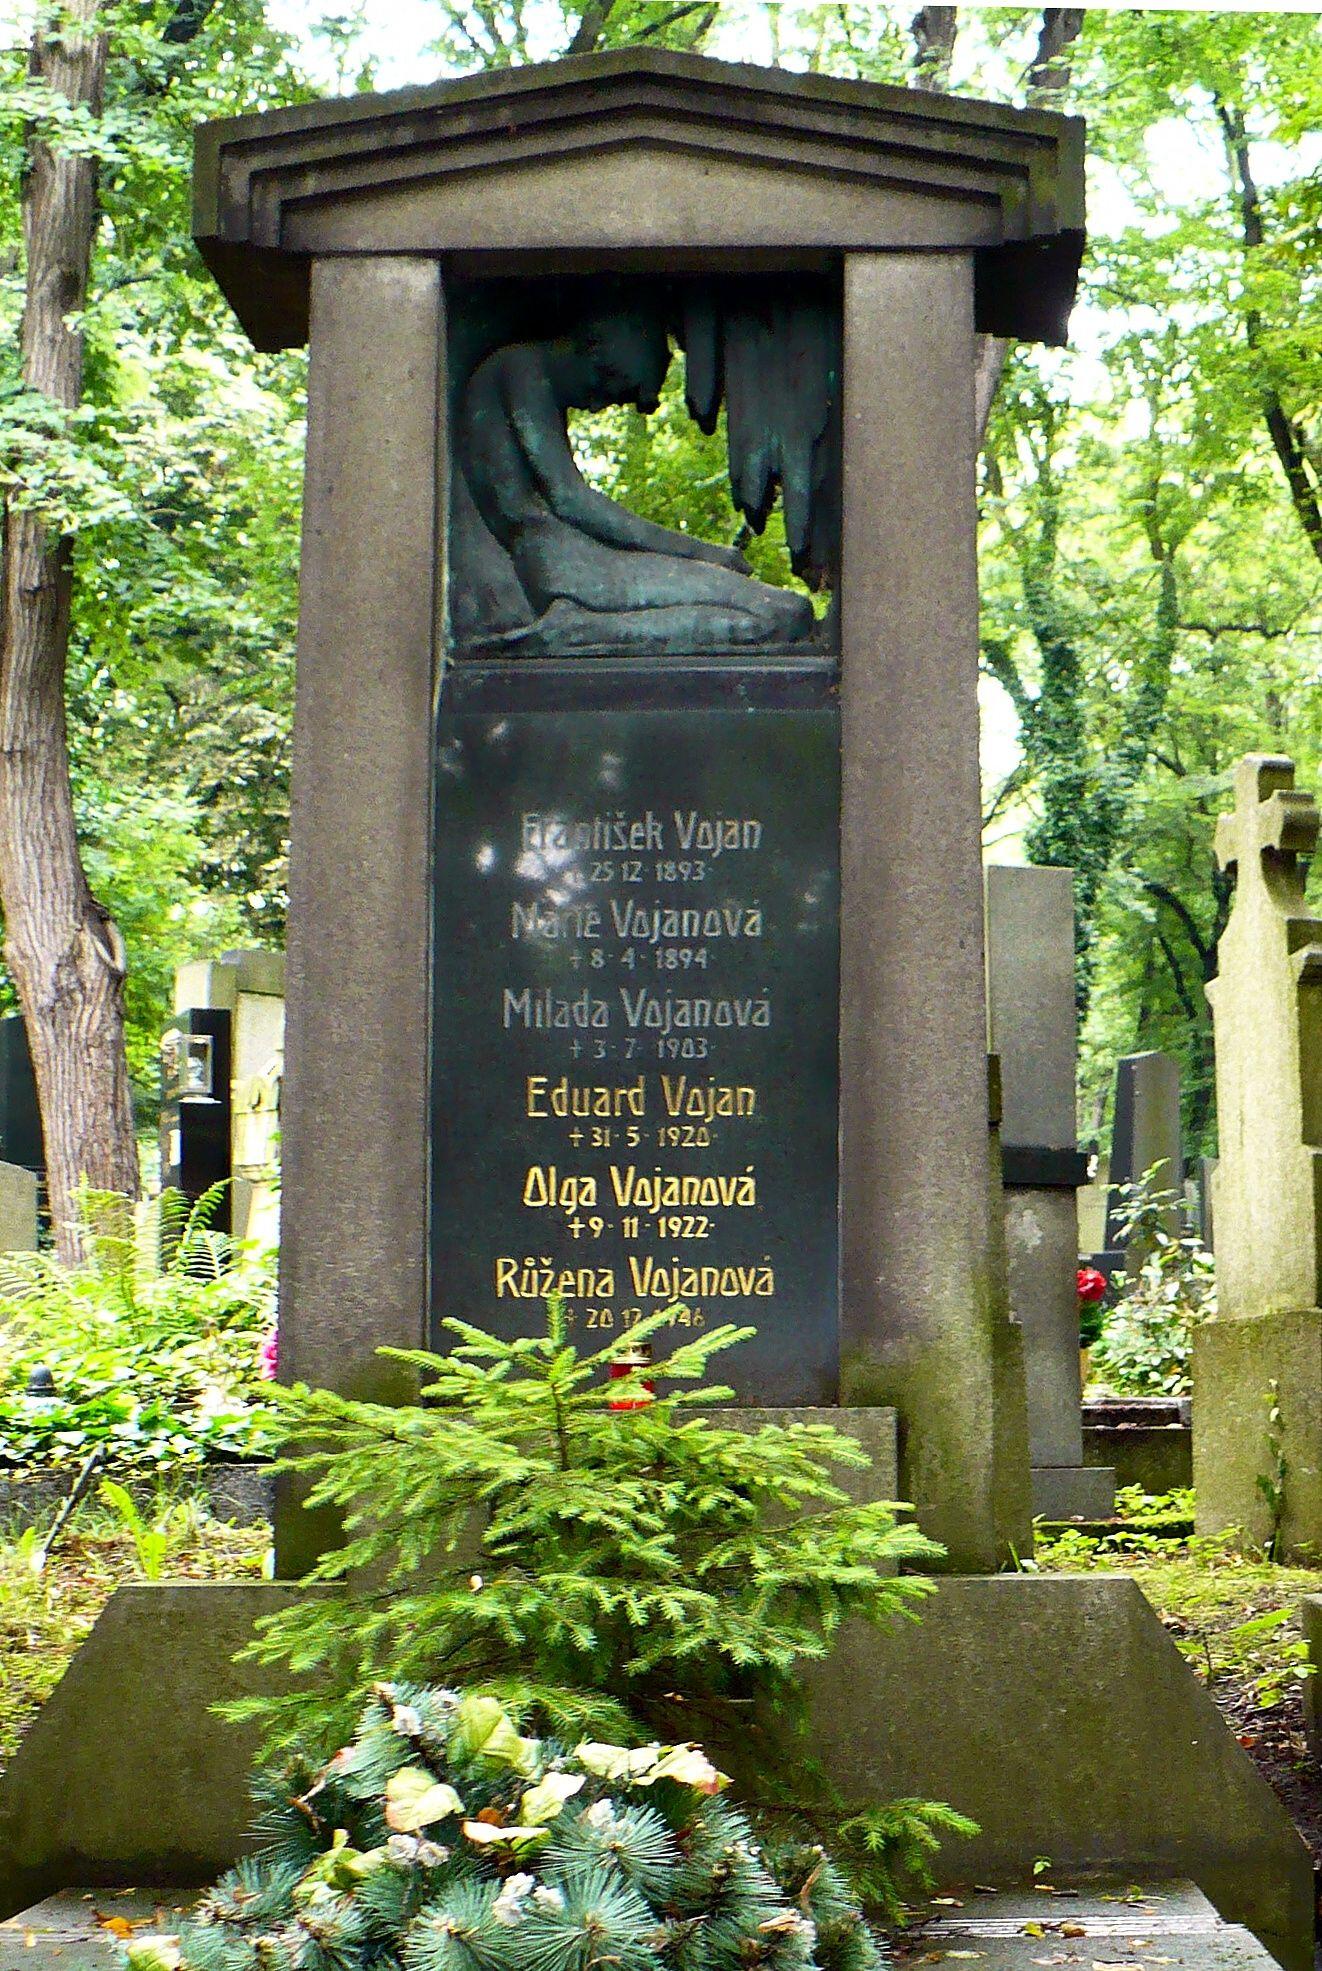 Tomb of Eduard Vojan